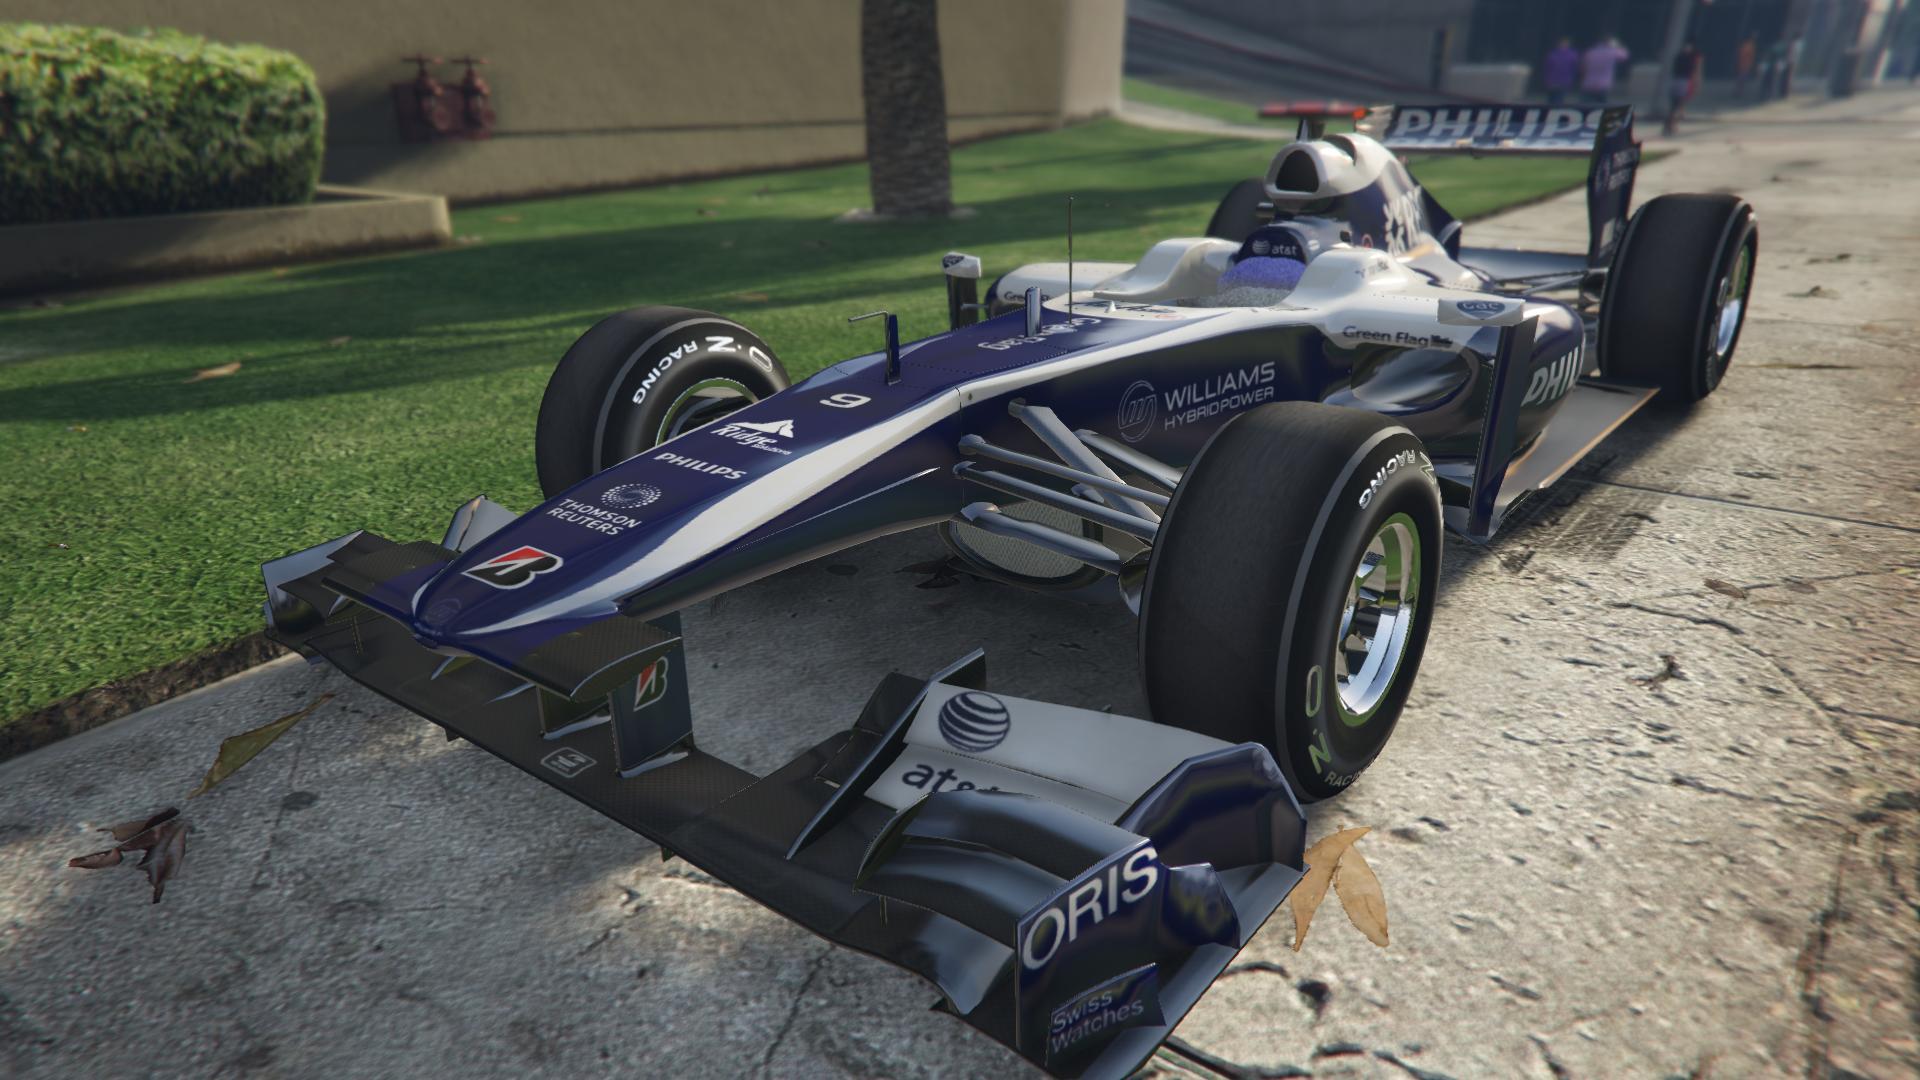 Williams F1 для GTA V - Скриншот 3